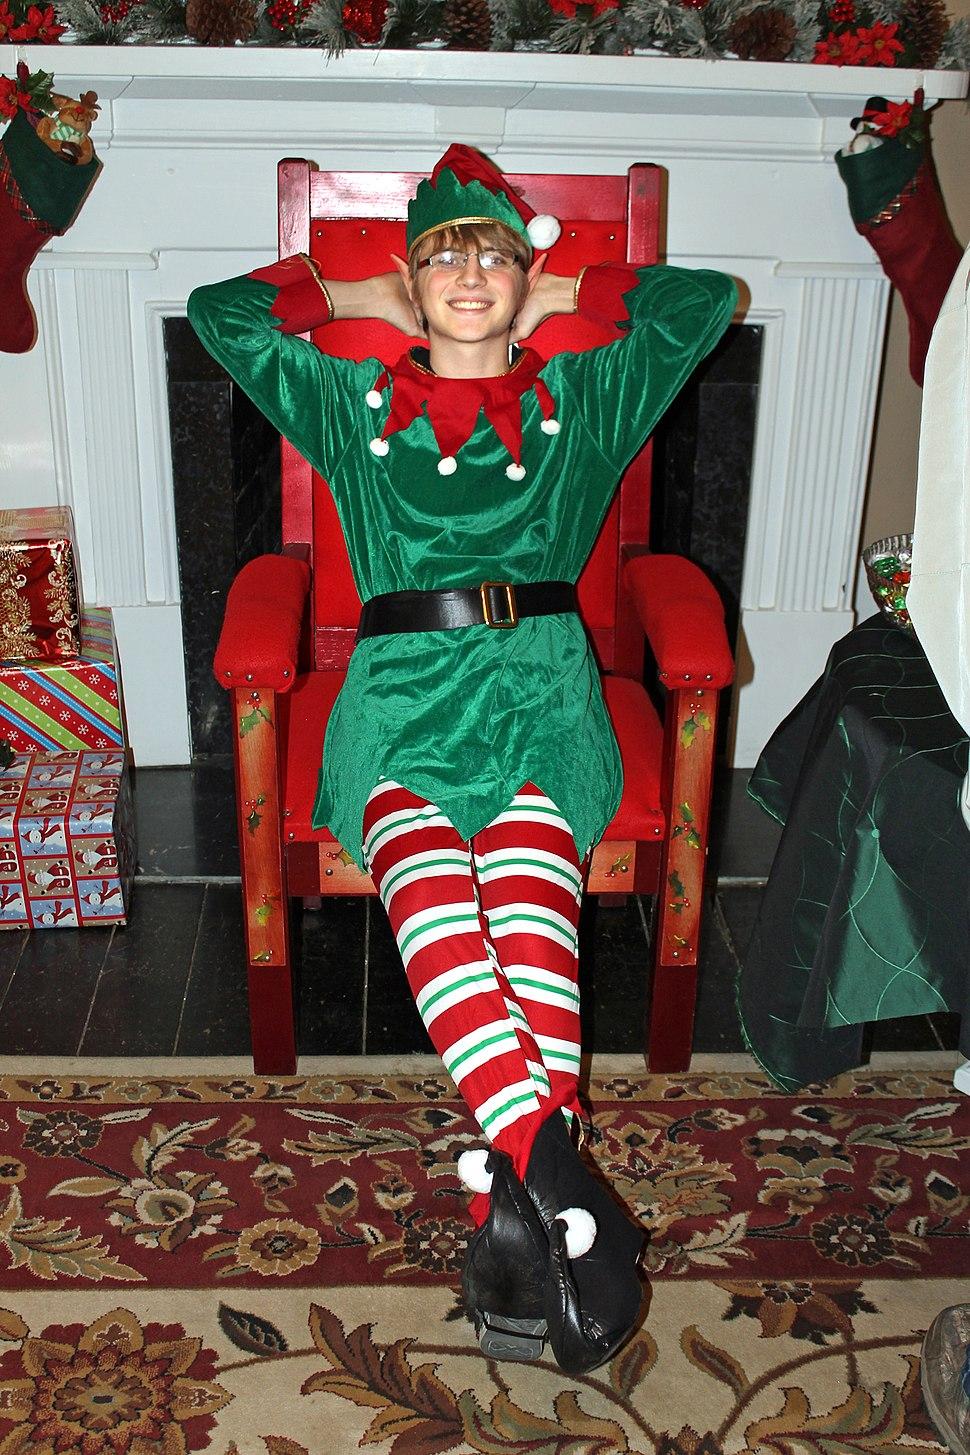 ChristmasFest 2016 (30822904564)